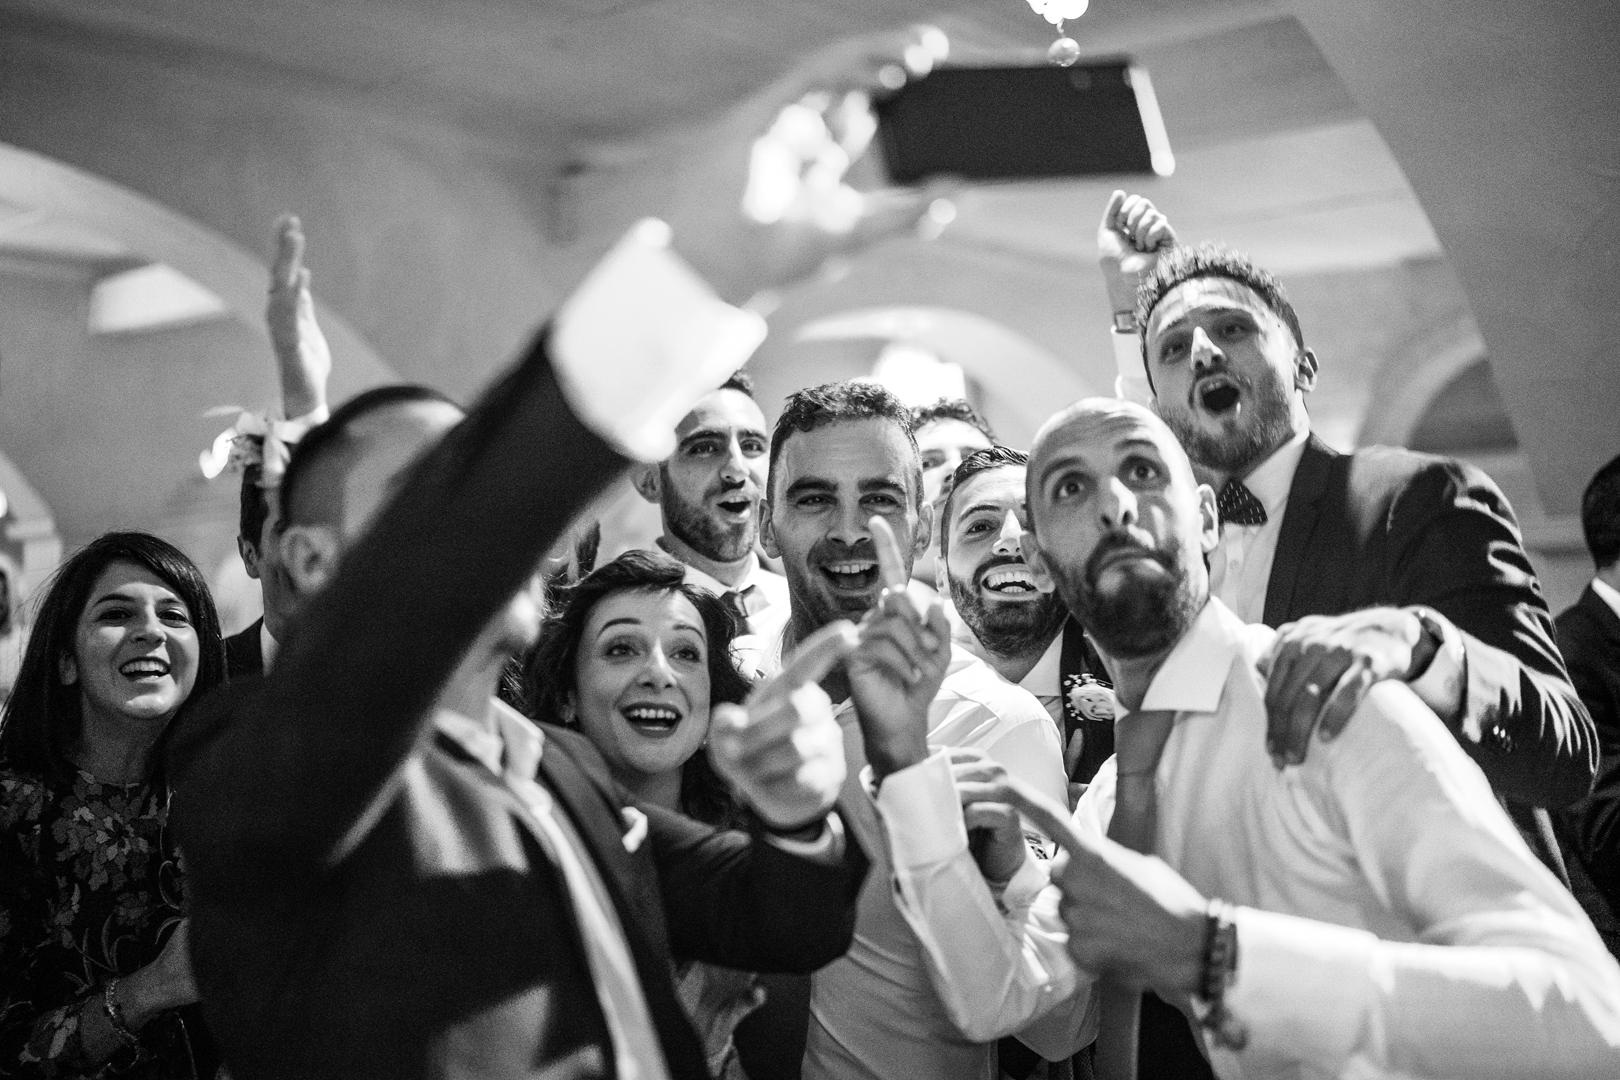 83 gianni-lepore-foto-selfie-amici